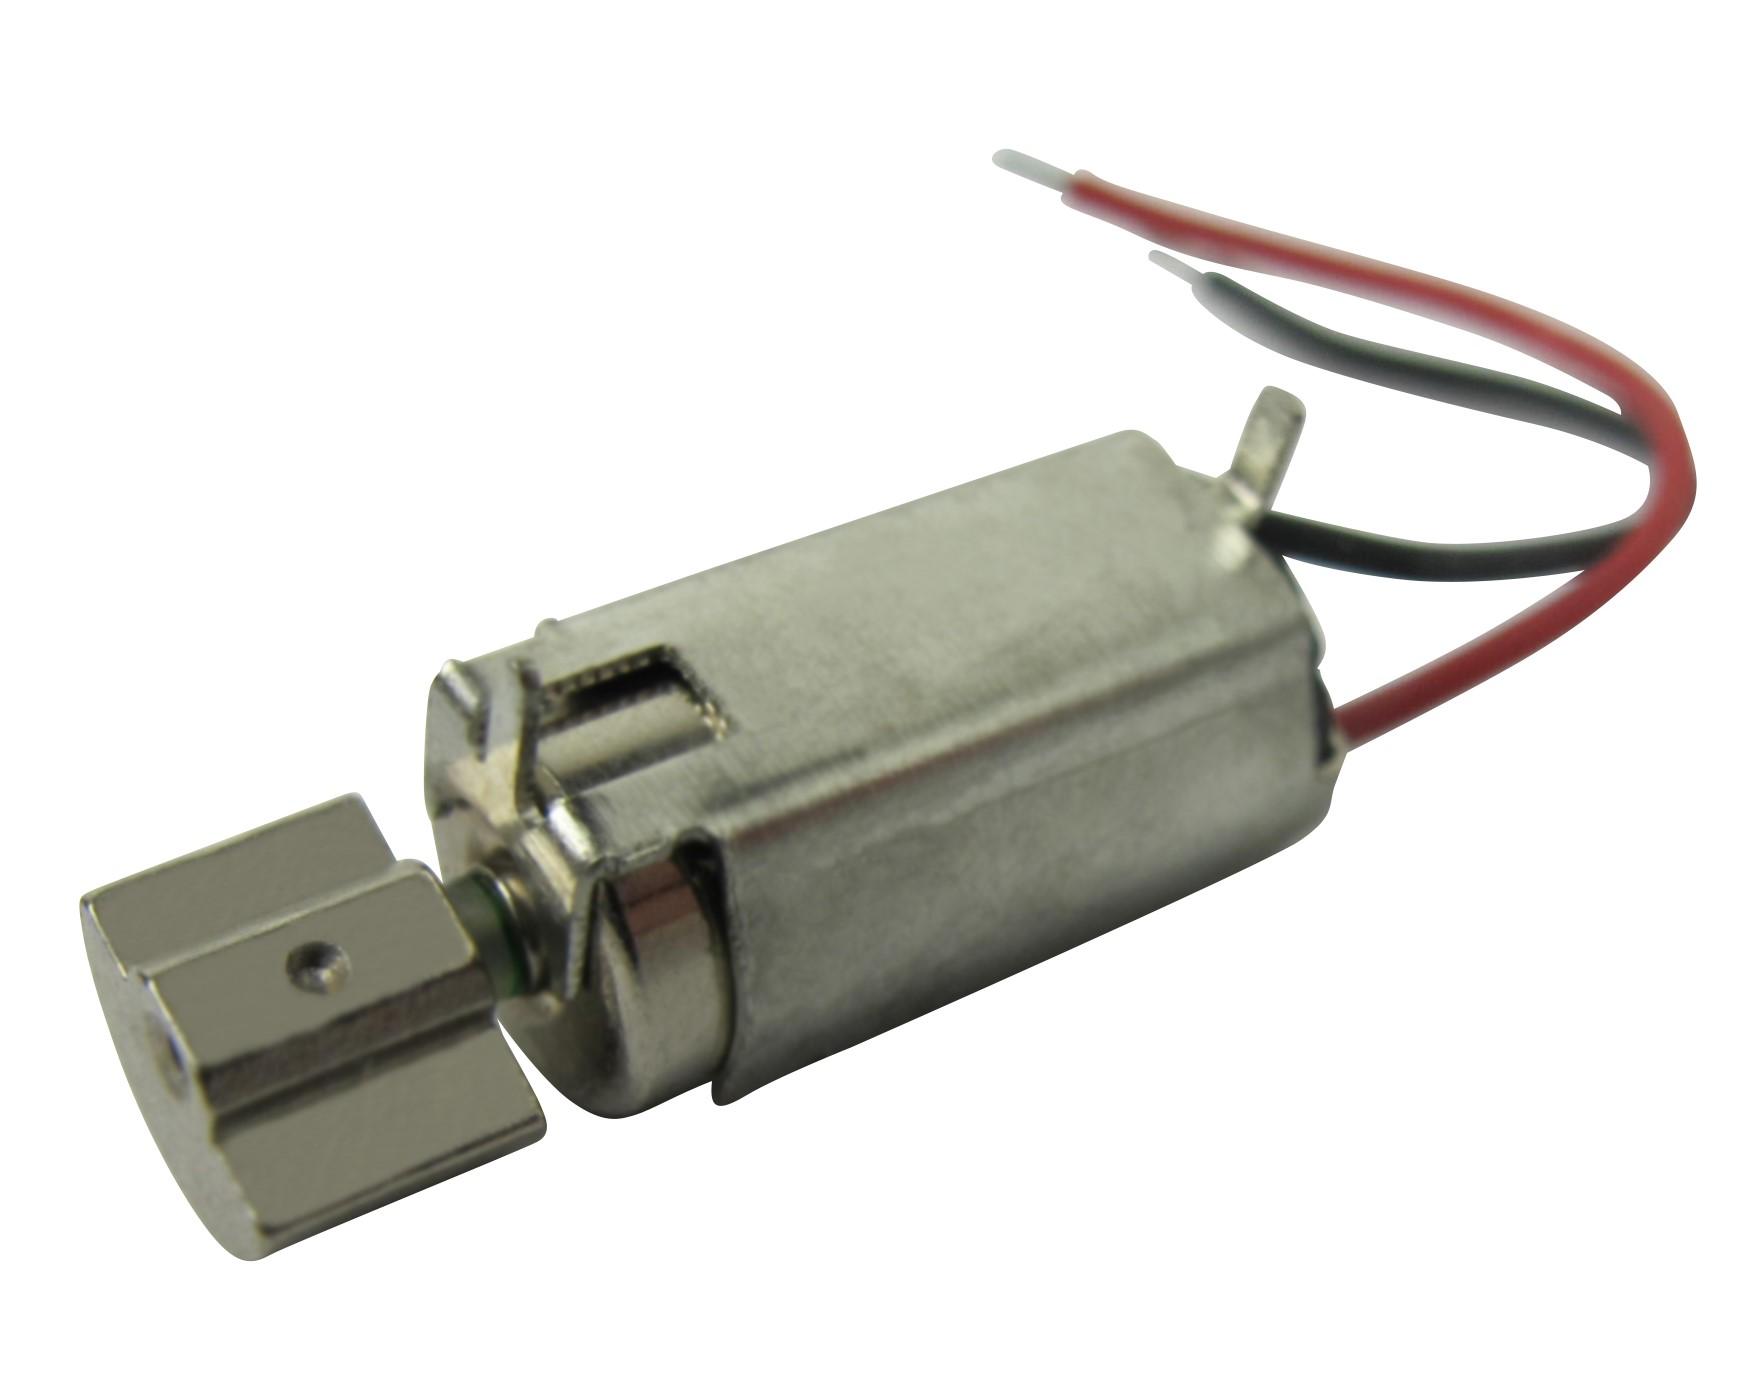 Z6DL2A0170441 Cylindrical Vibrator Motor